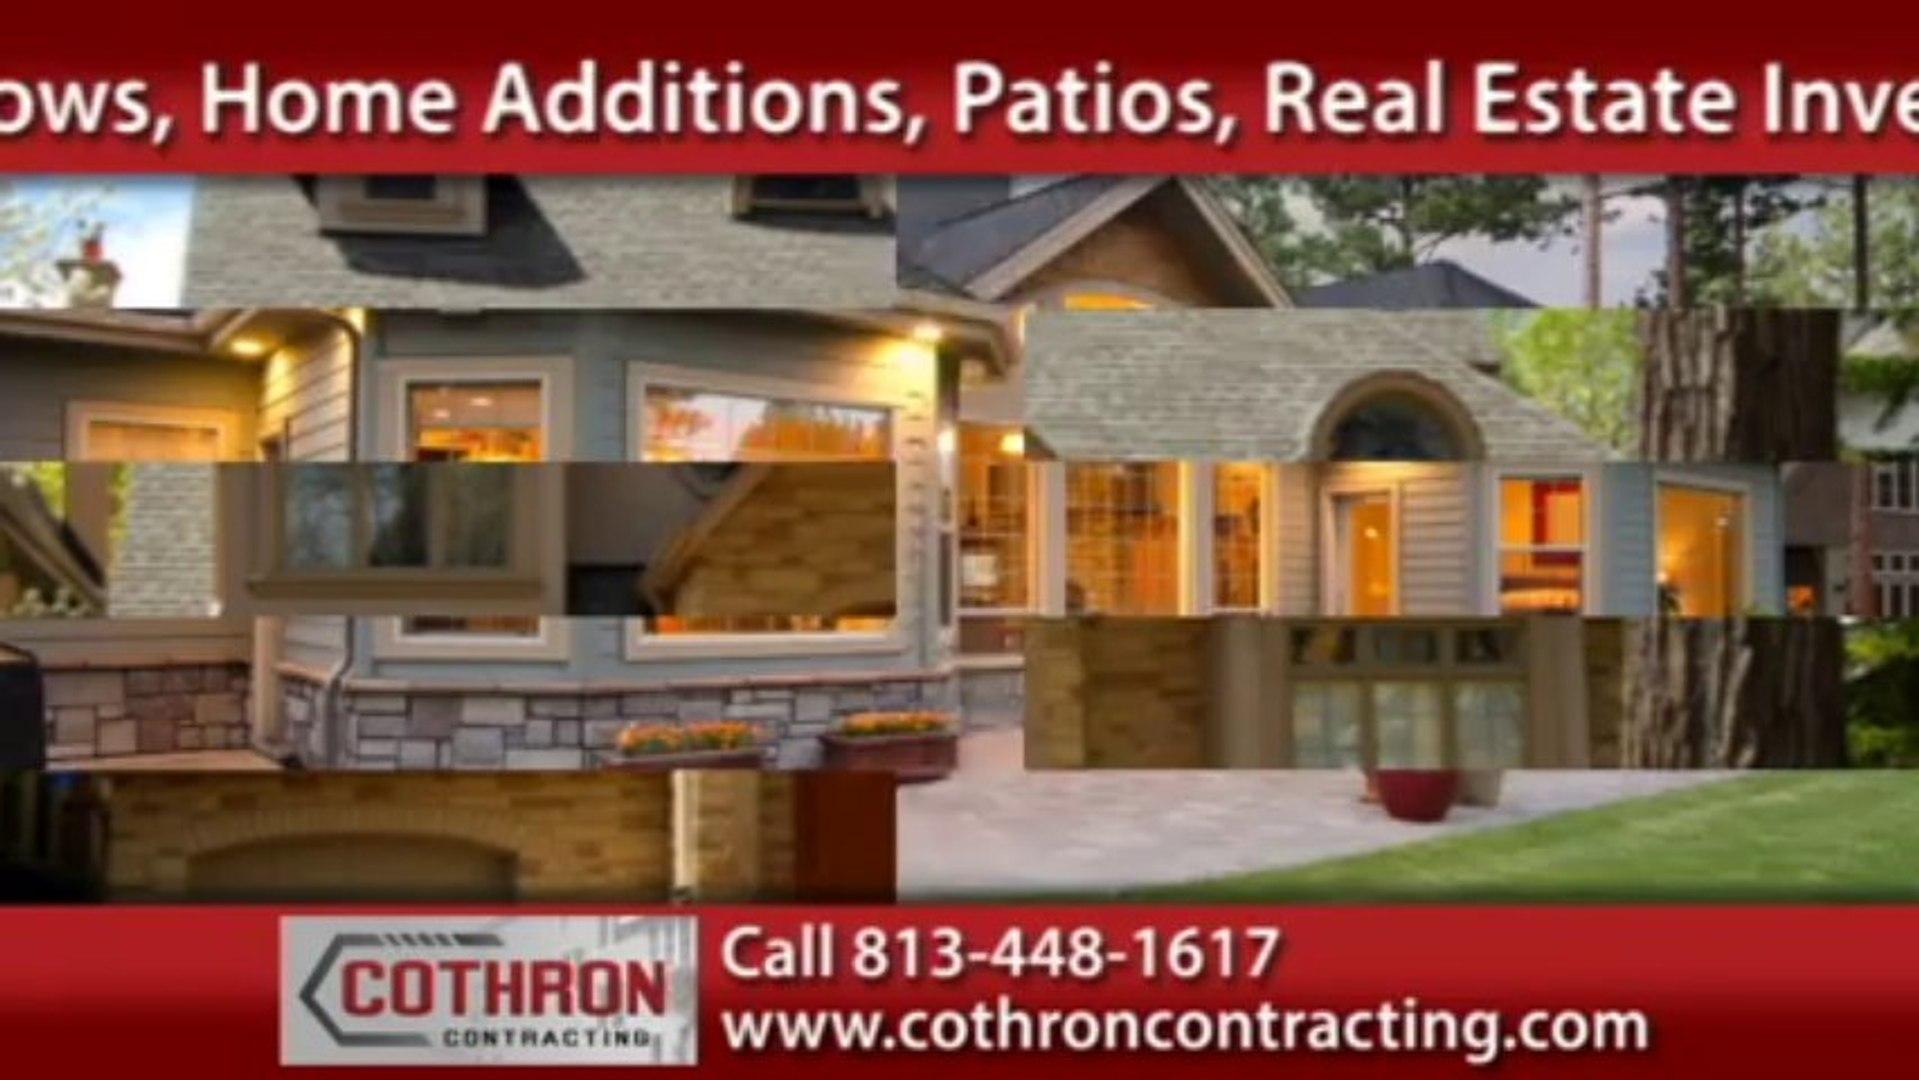 Bloomingdale Design & Build | Cothron Contracting LLC Call 813-685-4590